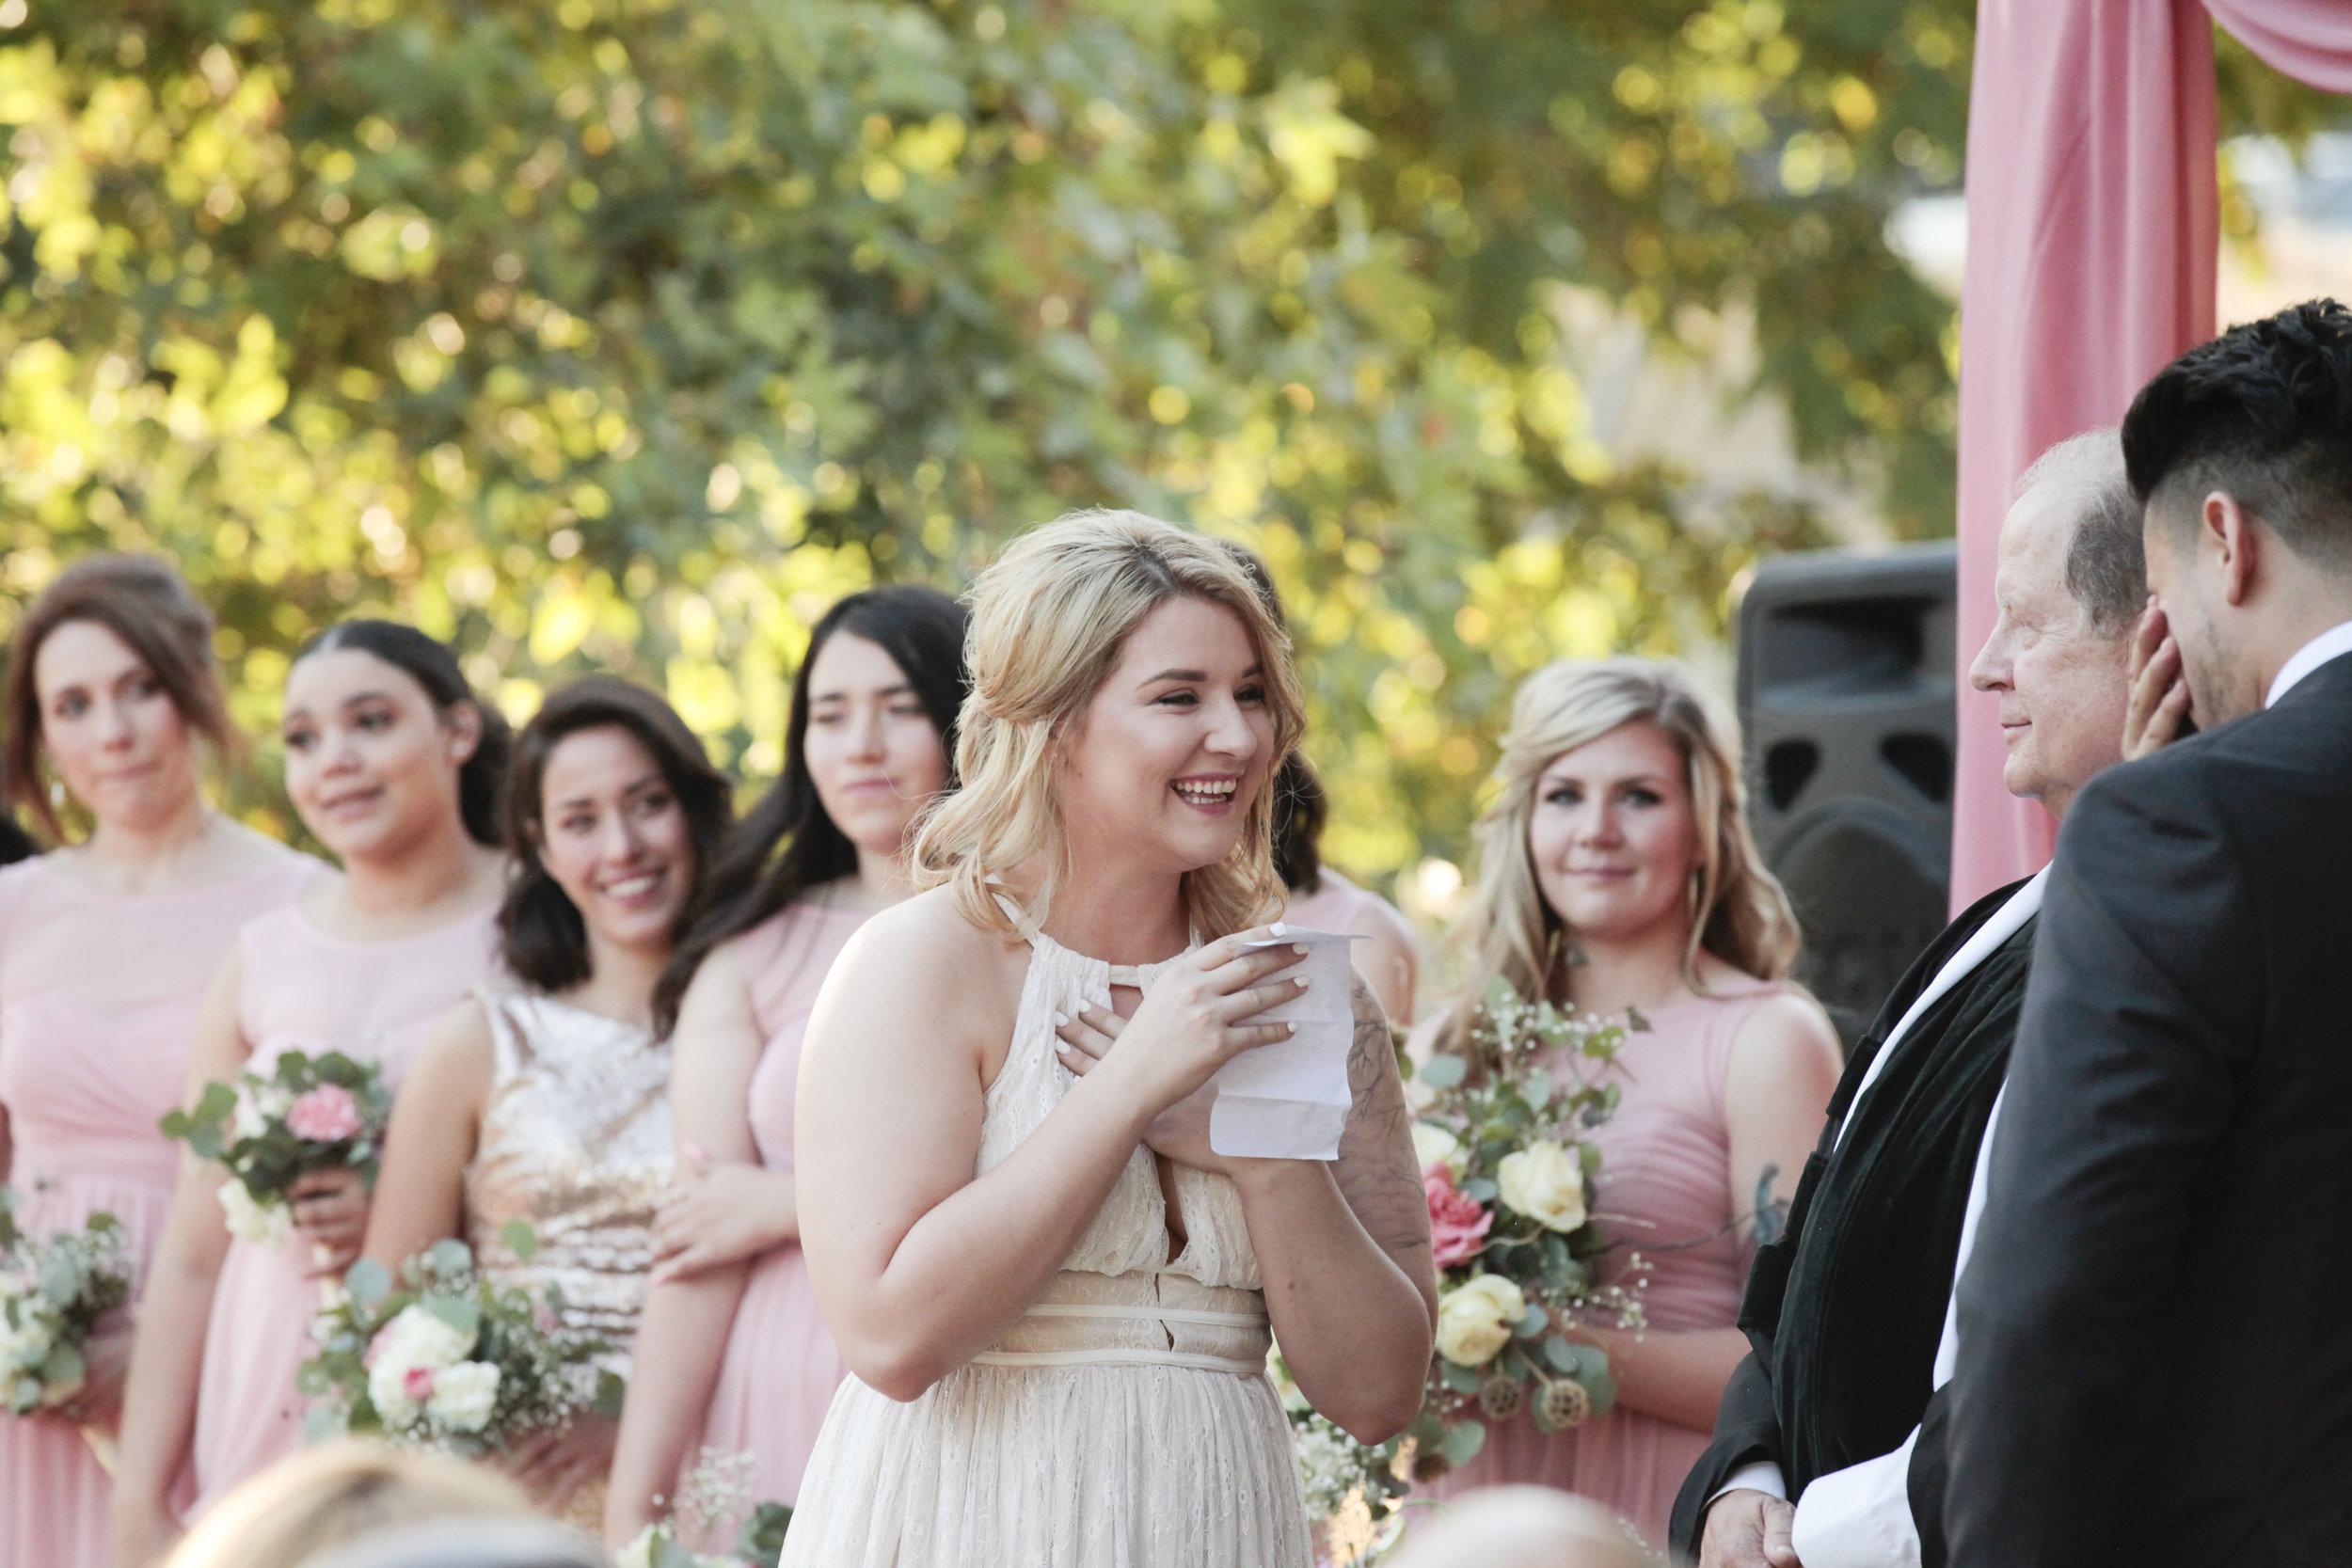 stephanieXmatt_wedding_149.jpg